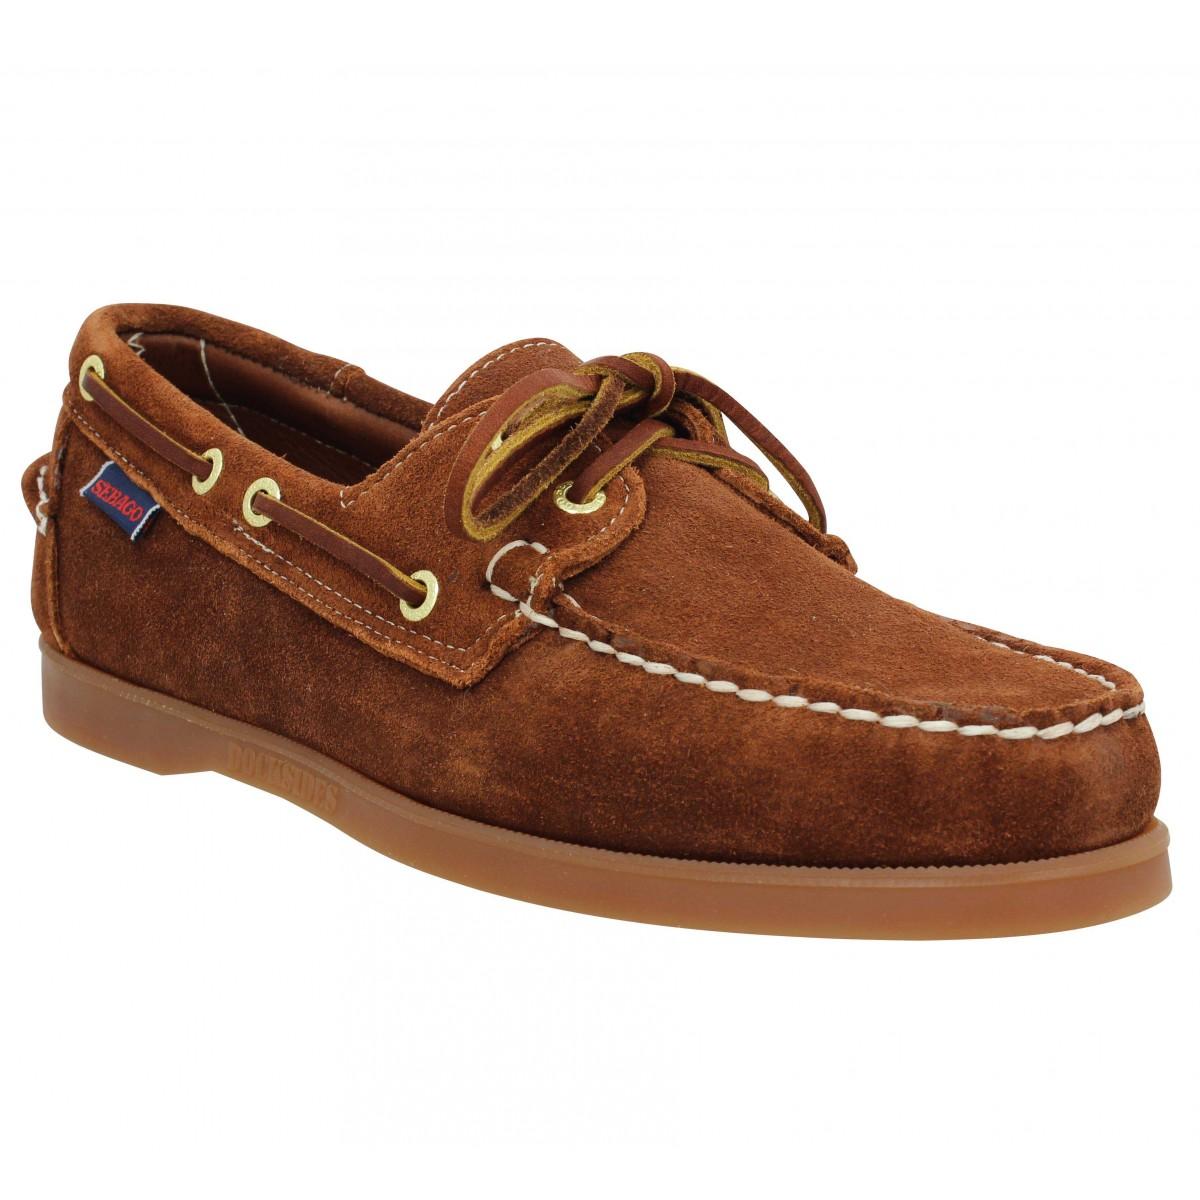 Sebago docksides velours homme cognac homme   Fanny chaussures b662bb359078